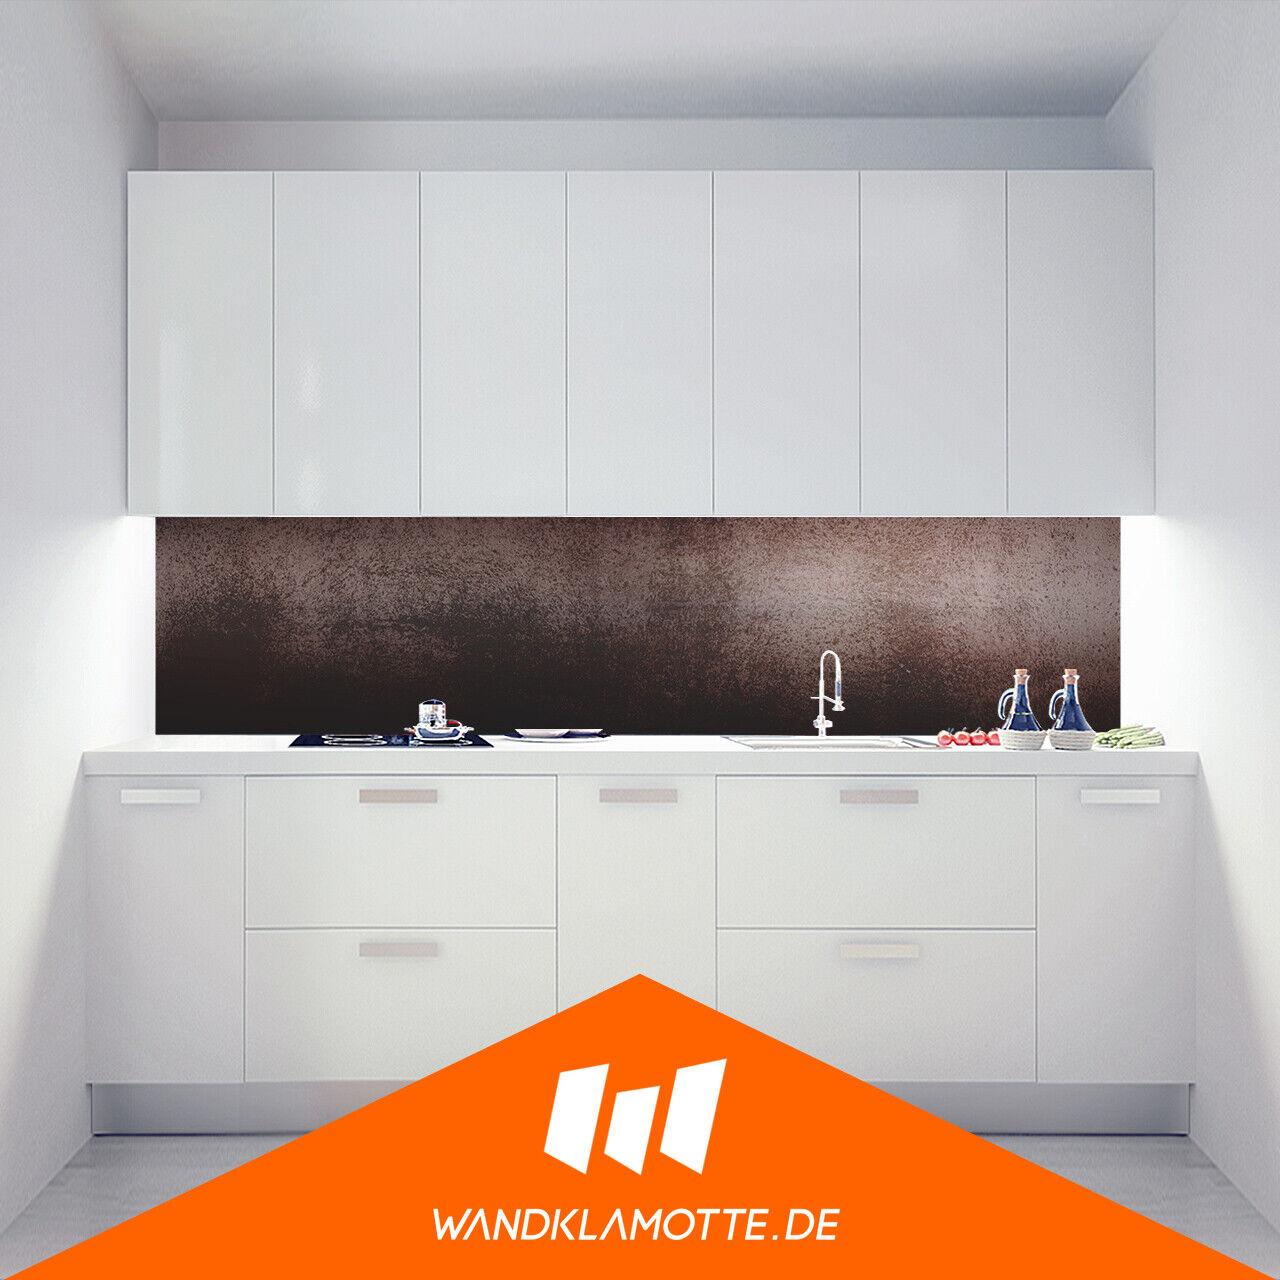 Küchenrückwand Acryl Glas Herd Spritzschutz Polished Rust